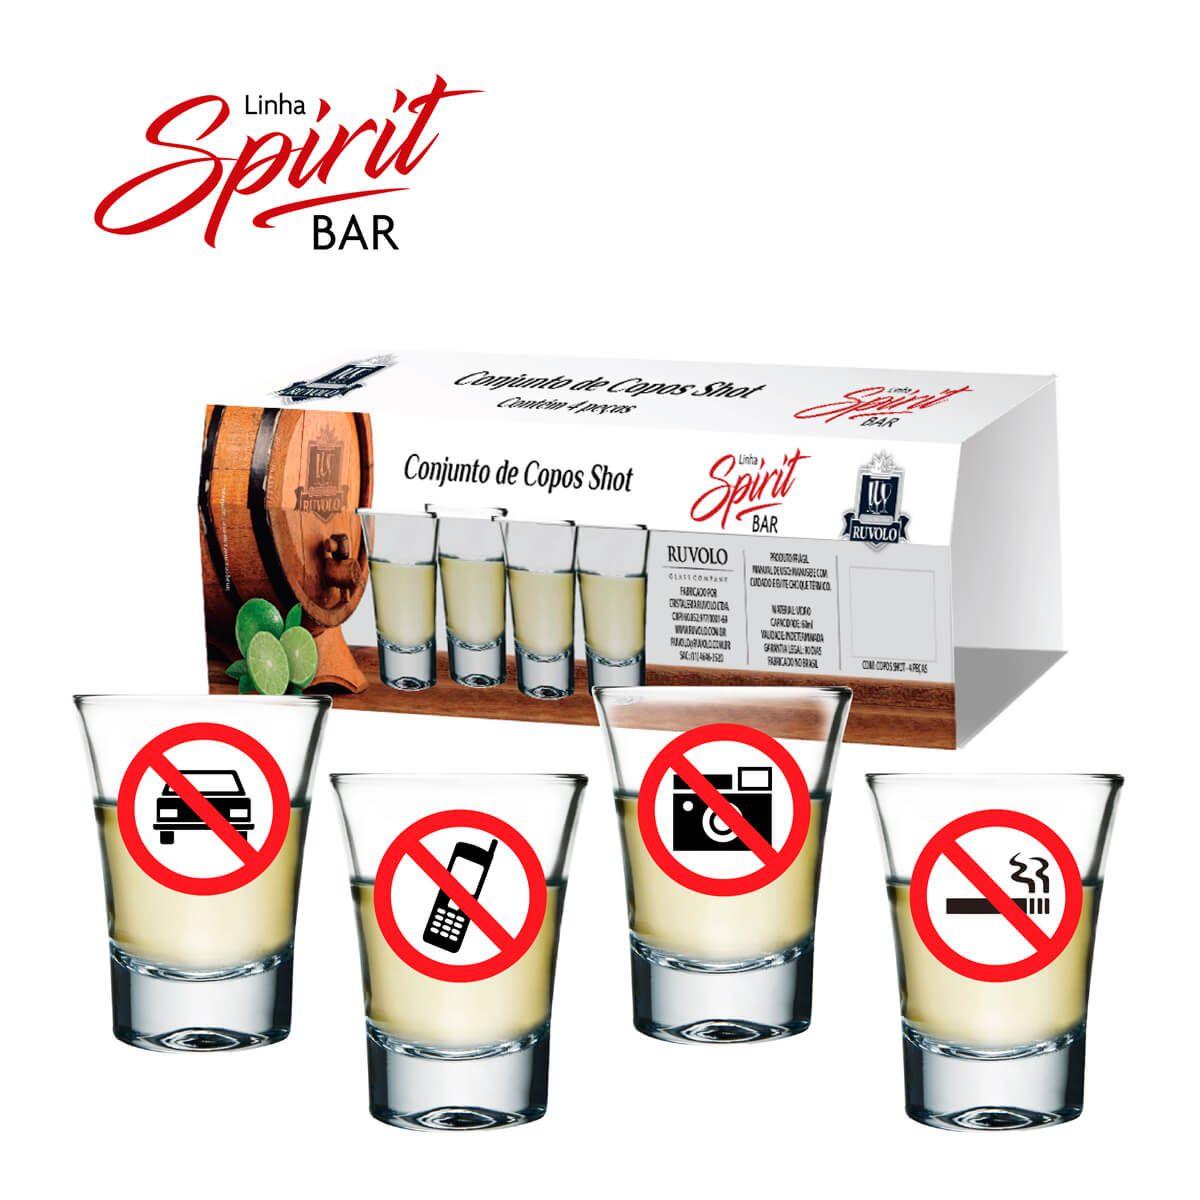 Copo de Vidro Shot Tequila Dose Cachaça 60ml 4 Pcs